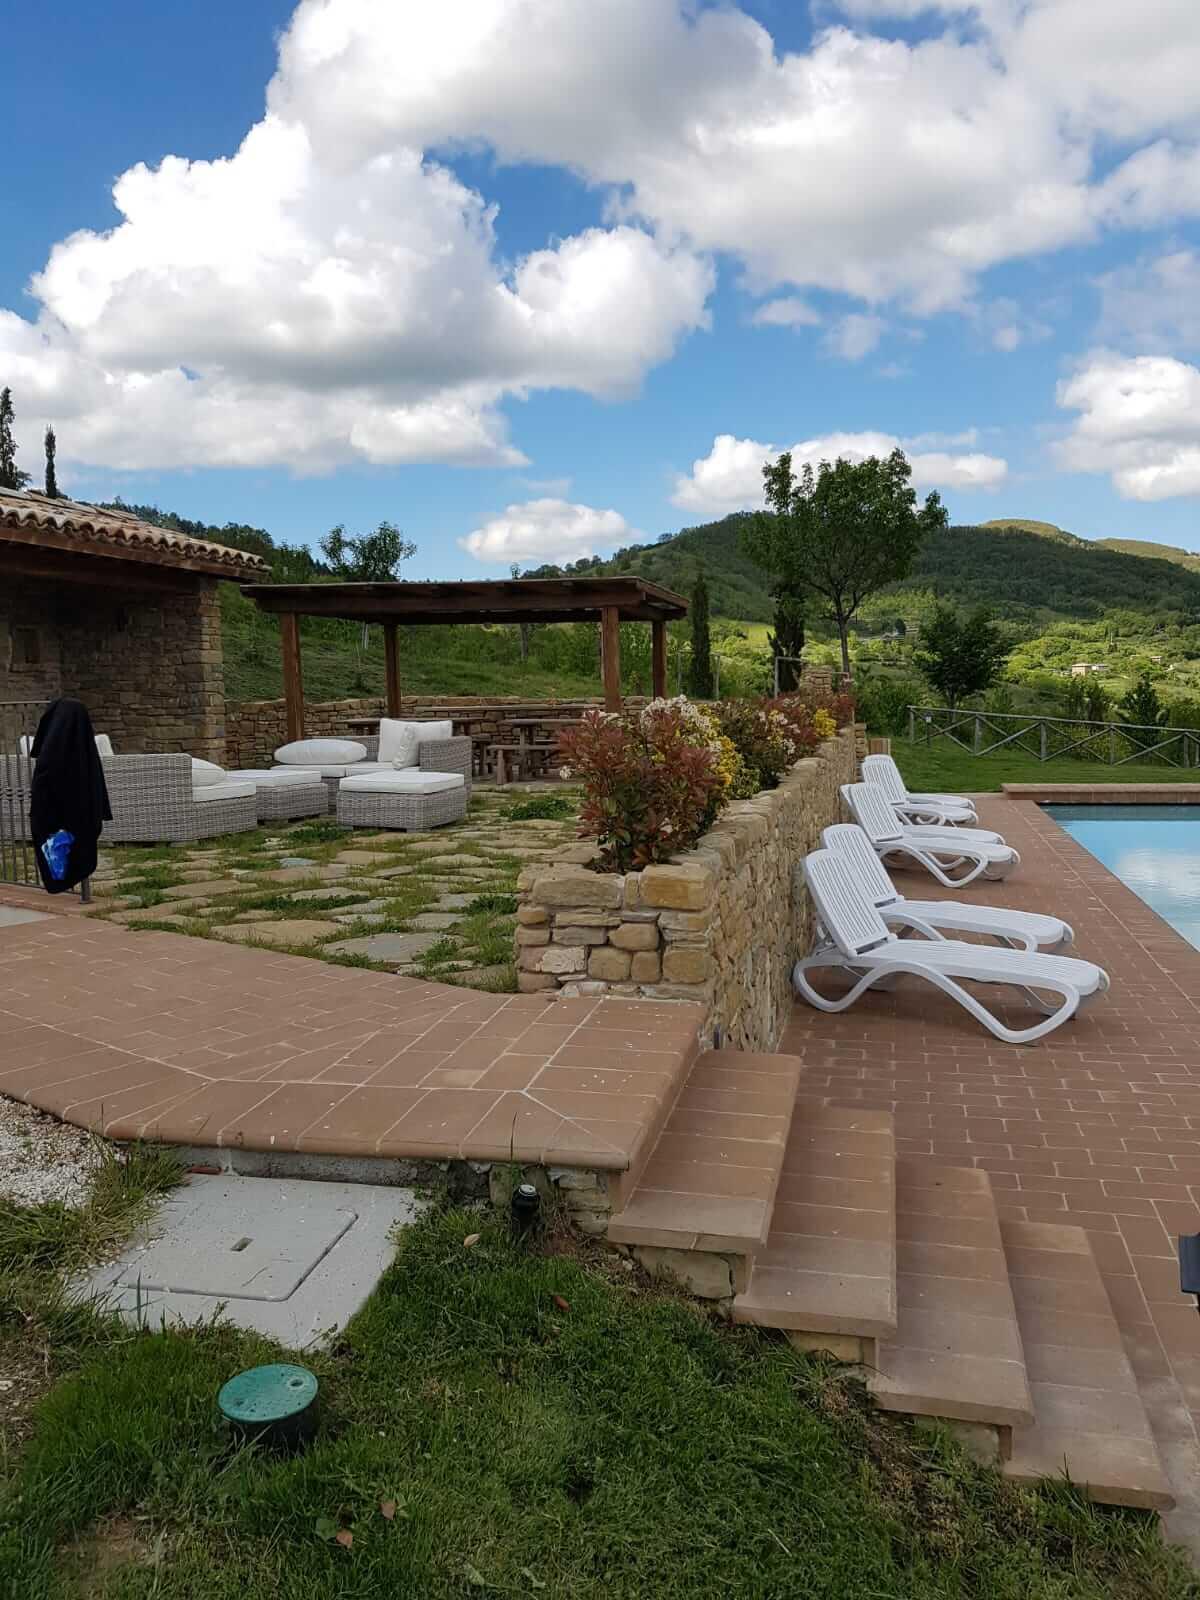 Assisi 4-6 gennaio - La piscina dell'Agriturismo Paradiso44